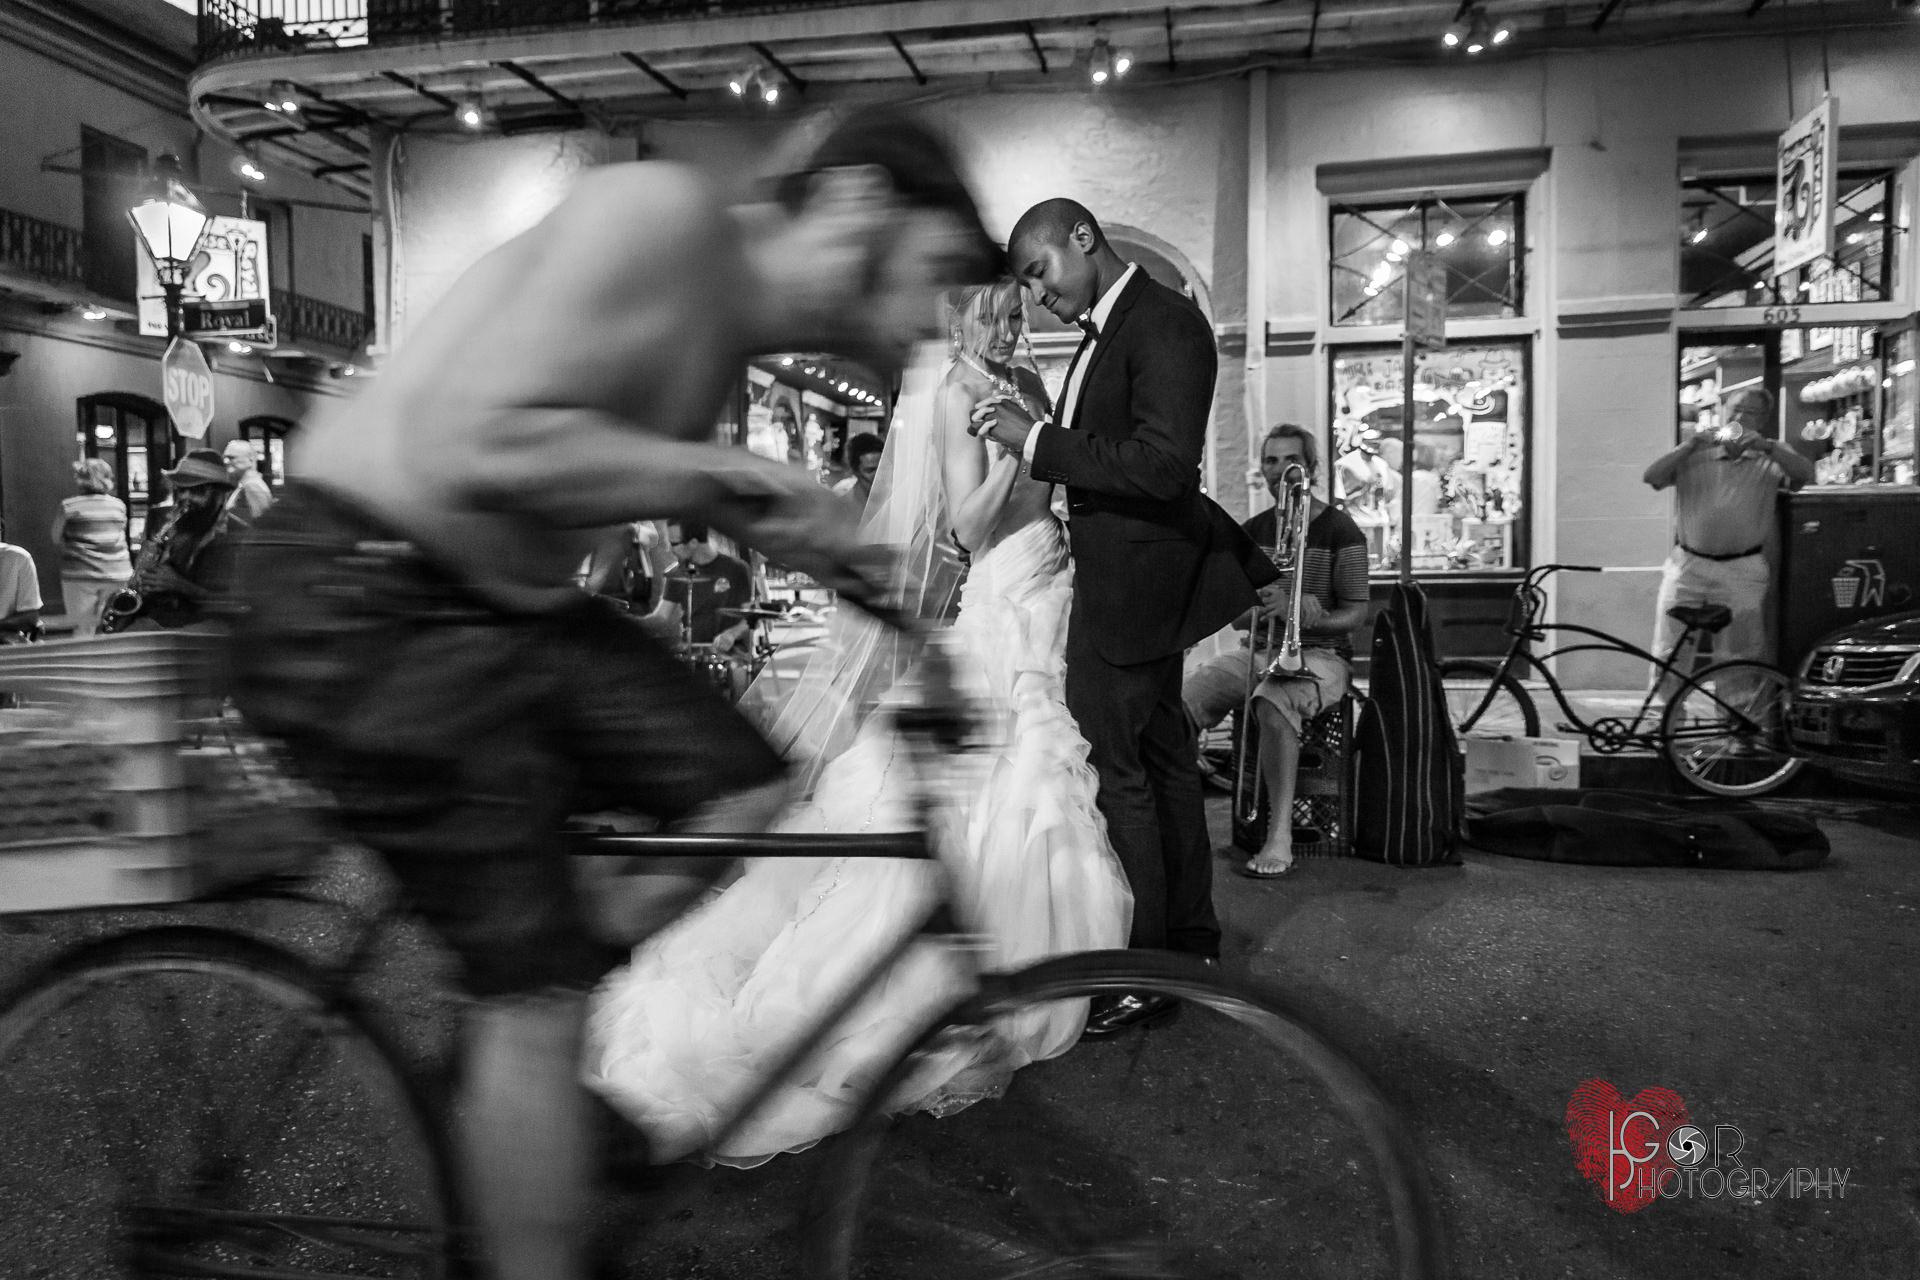 Street wedding photography in Nola